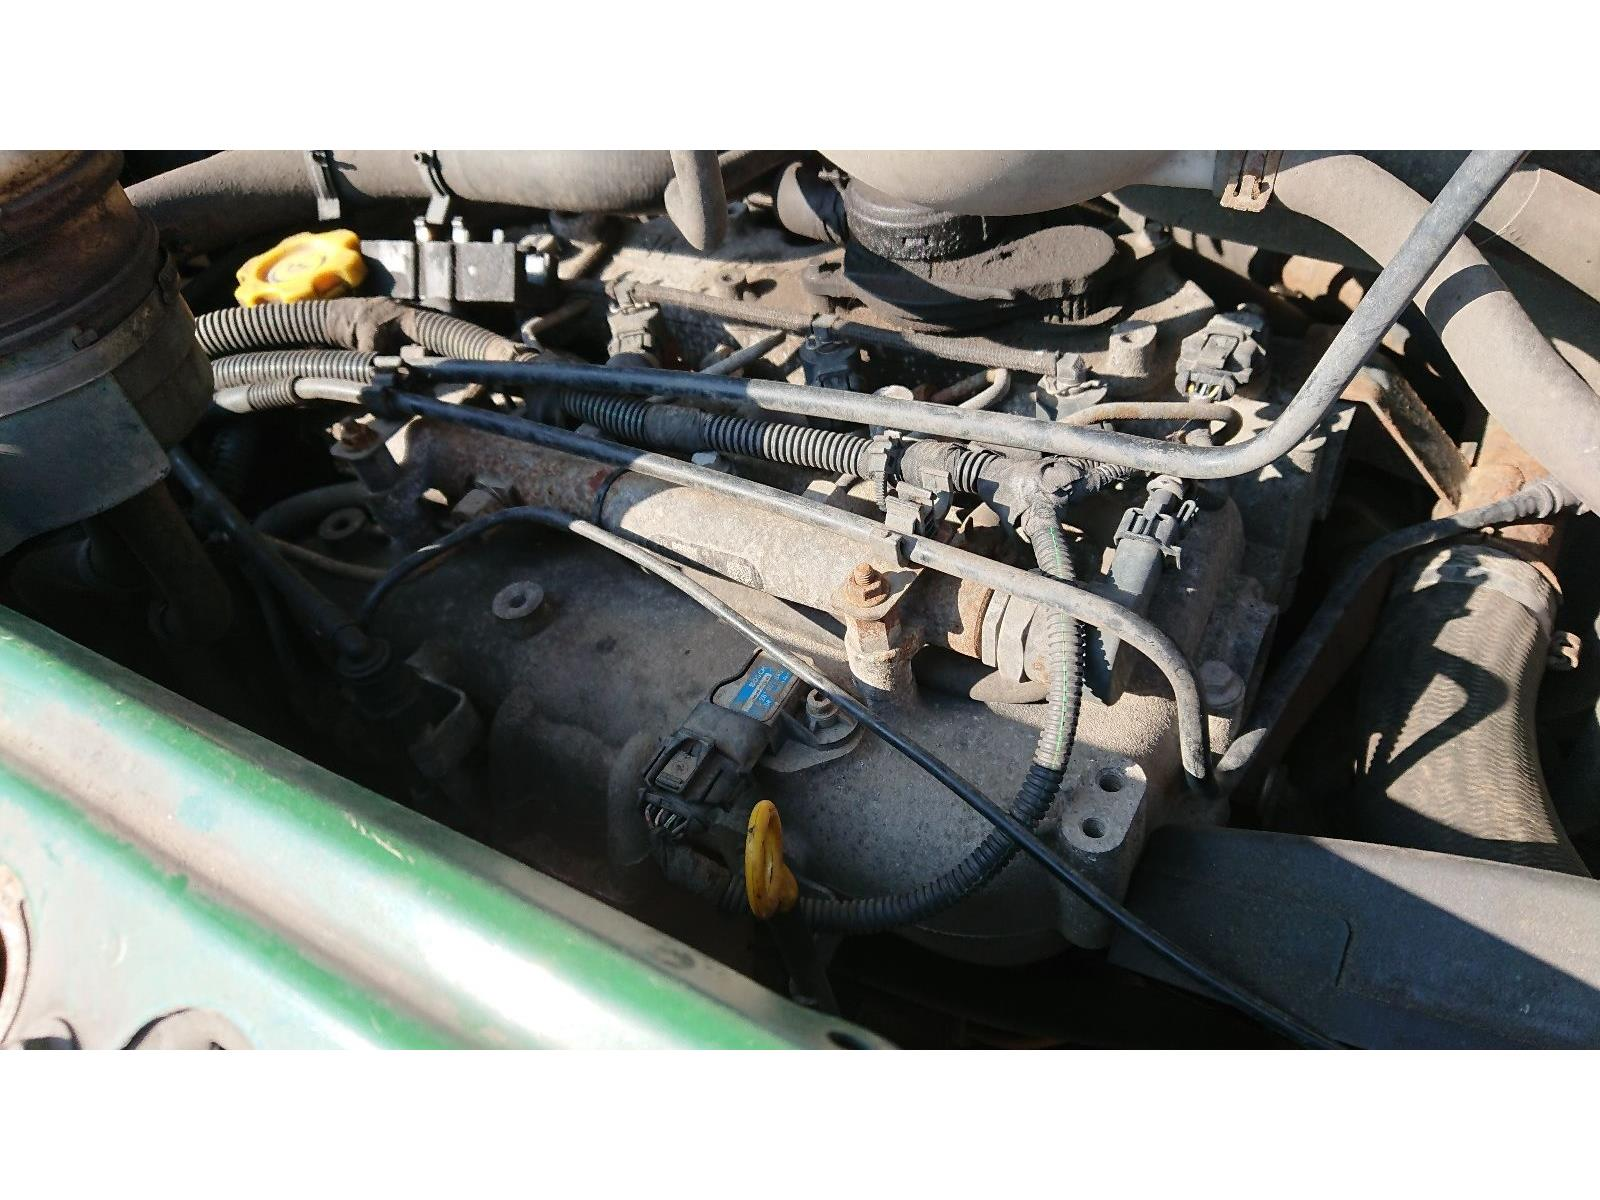 ... ENGINE LDV Maxus 08 On 2.5 120Bhp Diesel VMR425 (R2516L) & WARRANTY -  7380191 ...